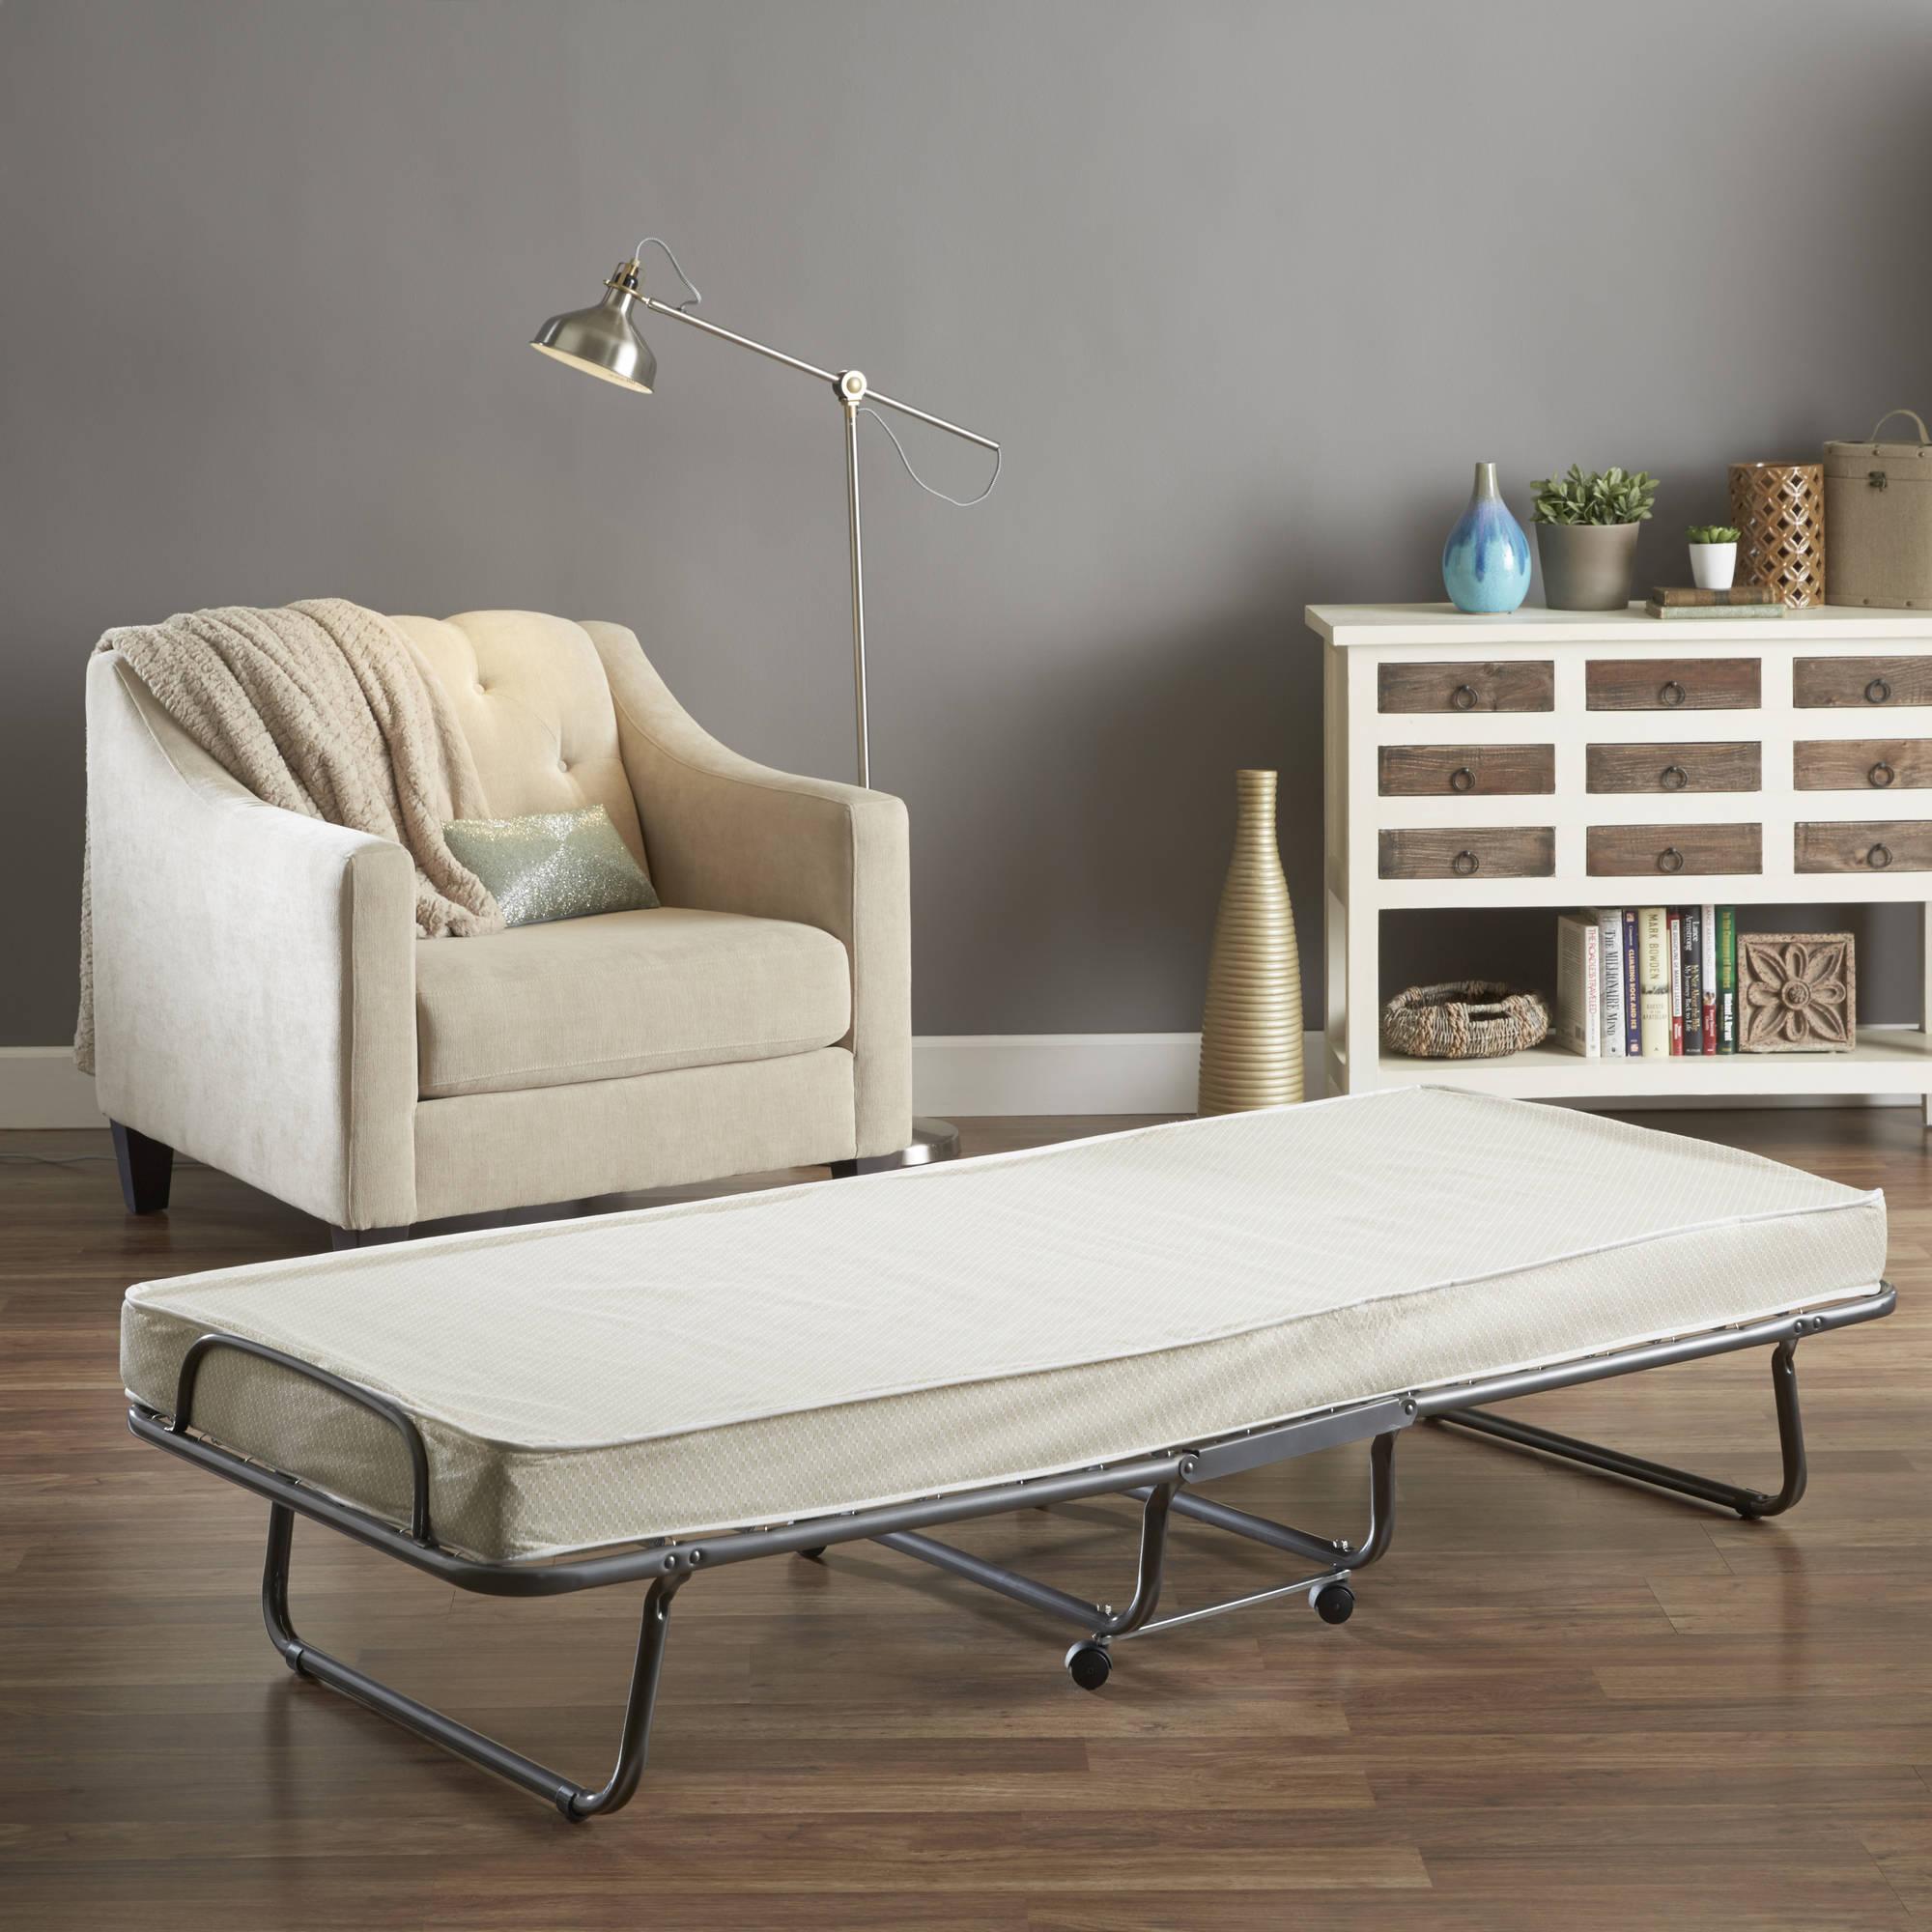 folding beds perlato folding bed rollaway twin guest ZWDPGMQ